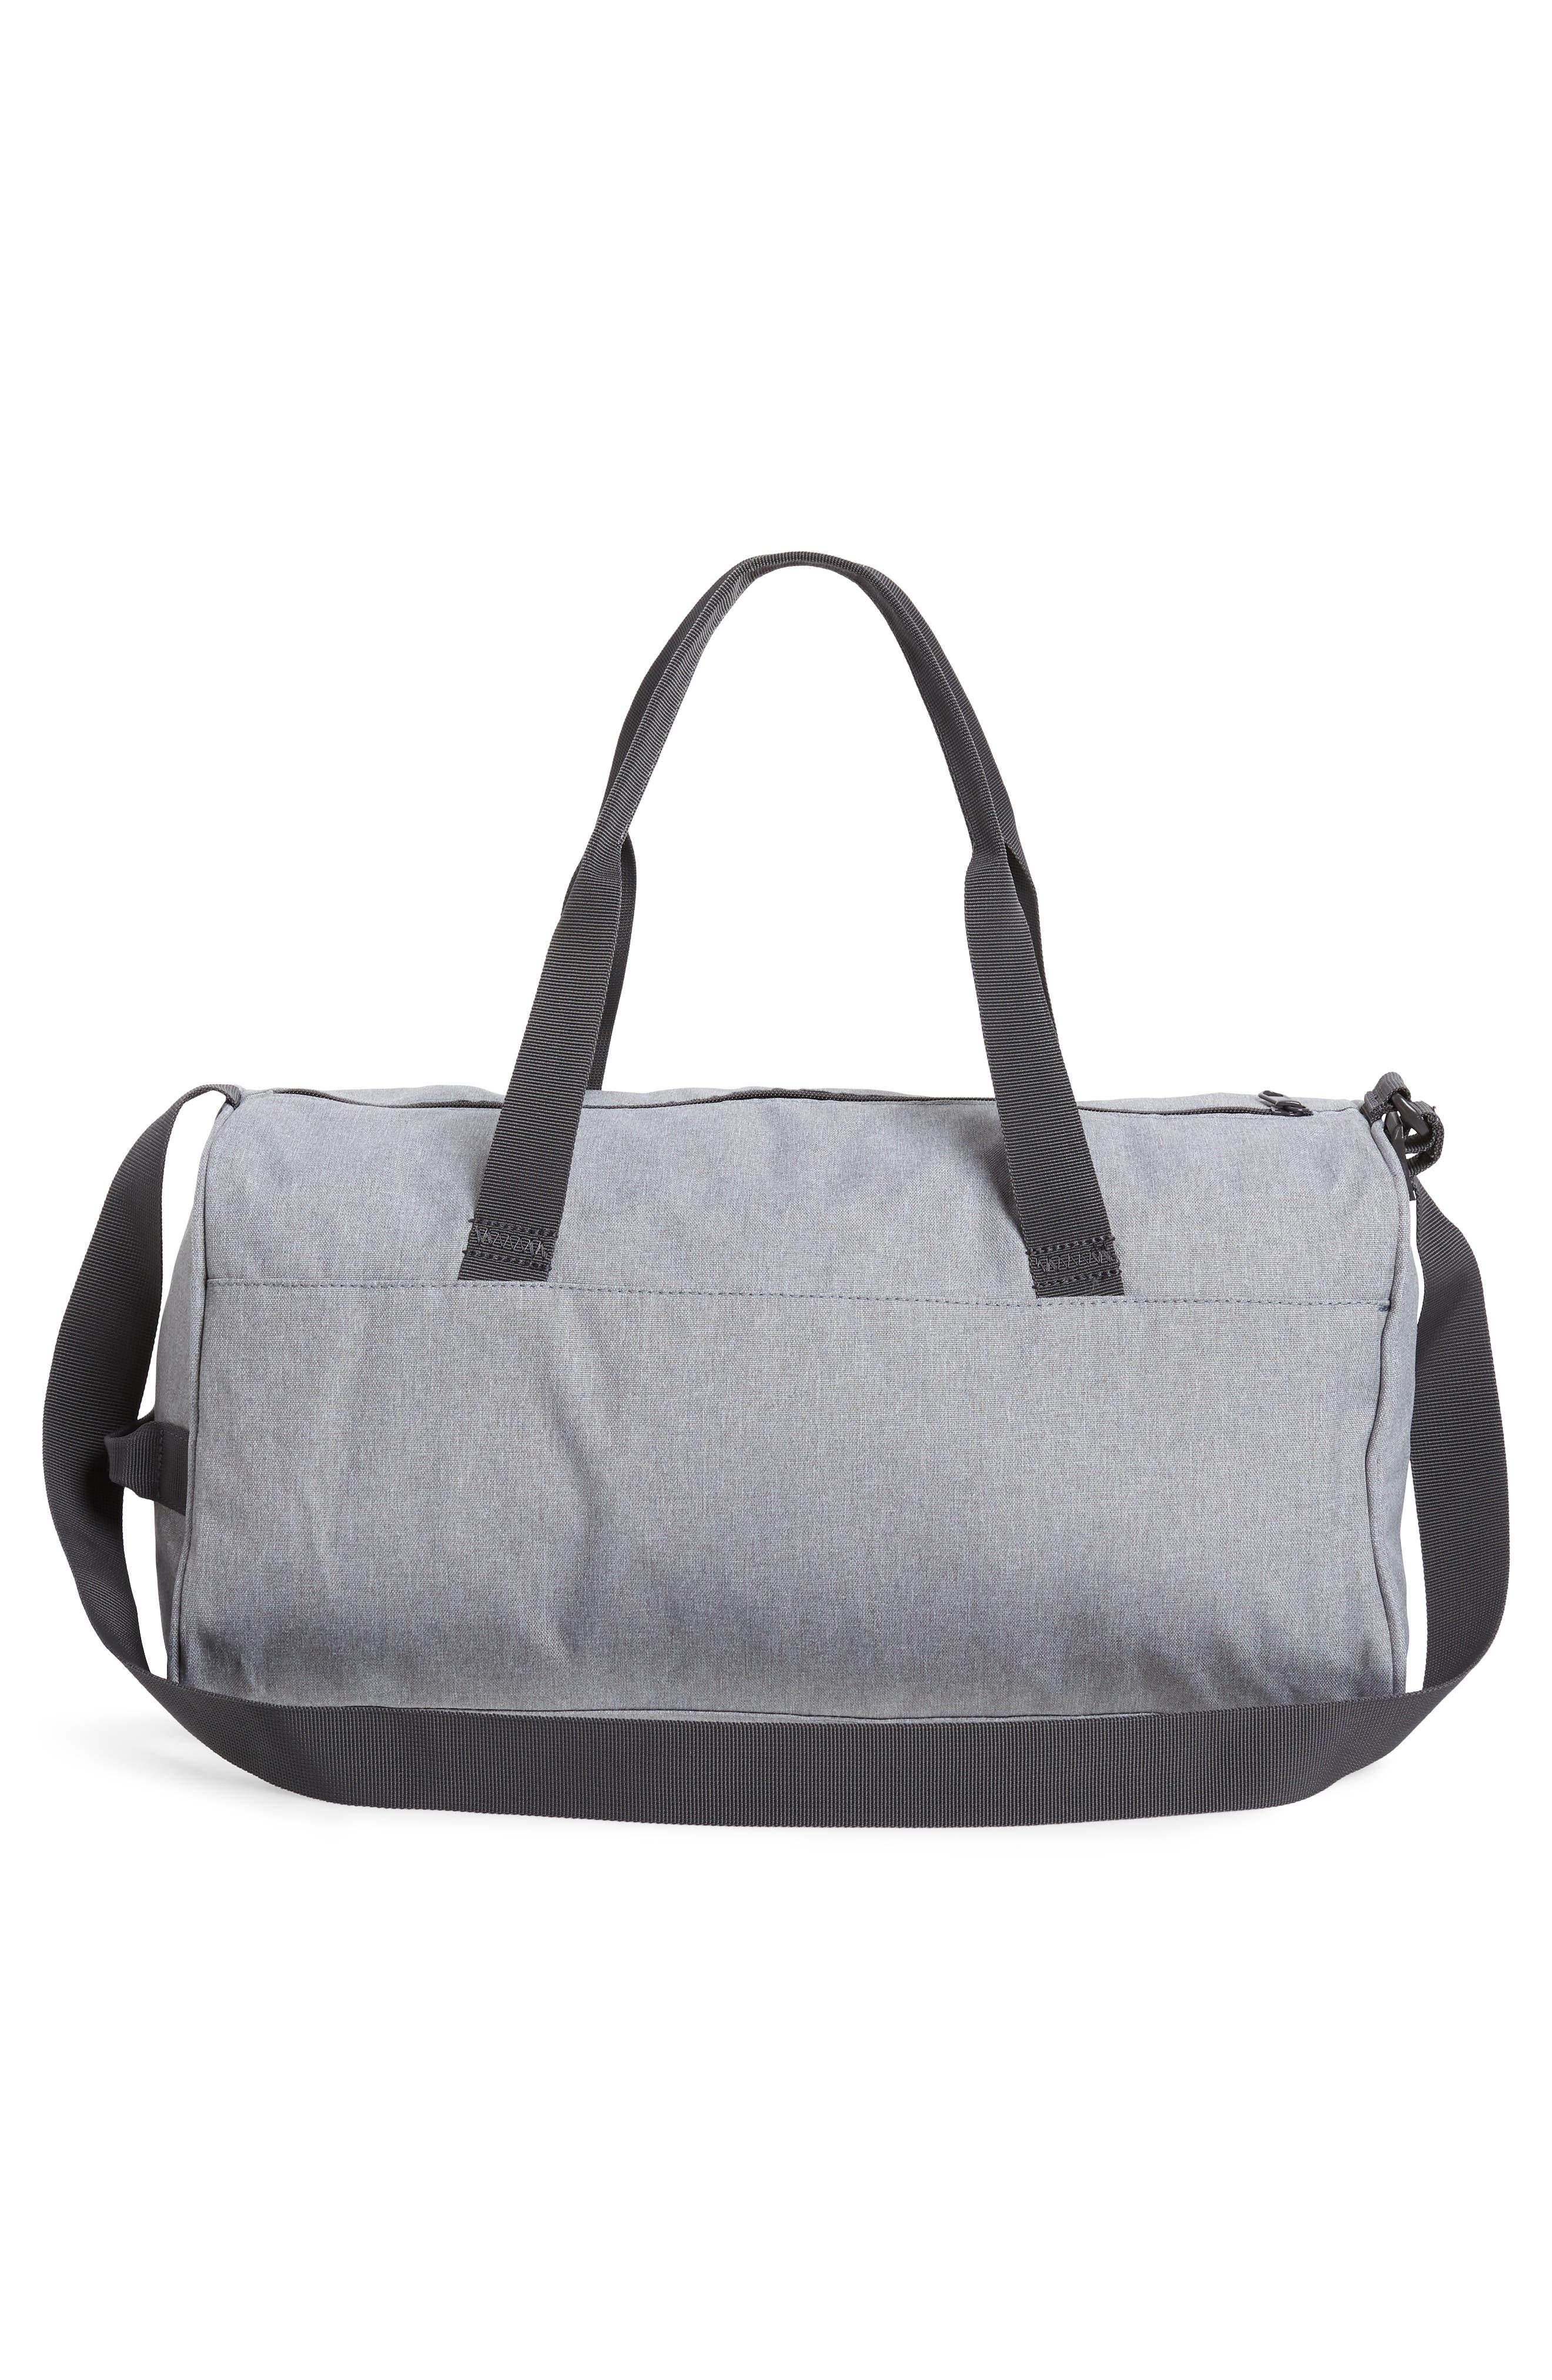 Select Water Resistant Duffel Bag,                             Alternate thumbnail 2, color,                             STEEL HEATHER /CHARCOAL/ORANGE